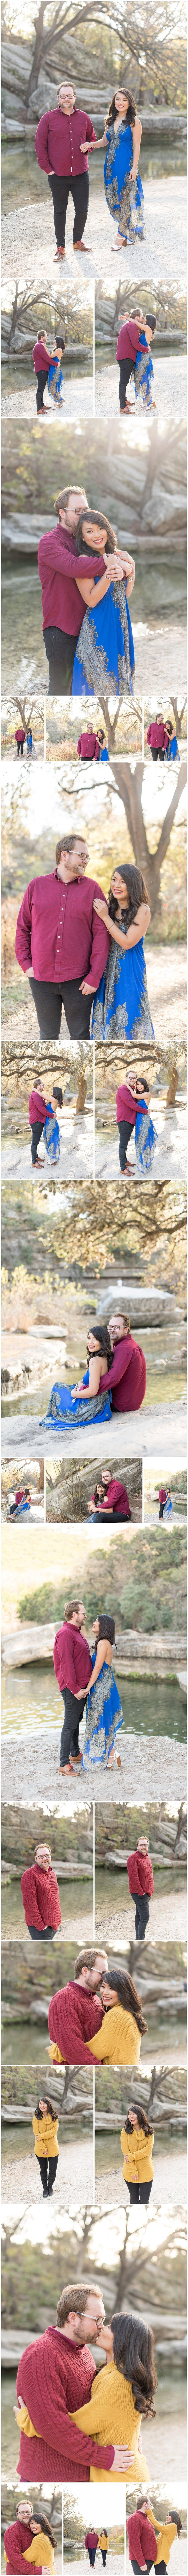 Jenny & Kevin Engagement.jpg